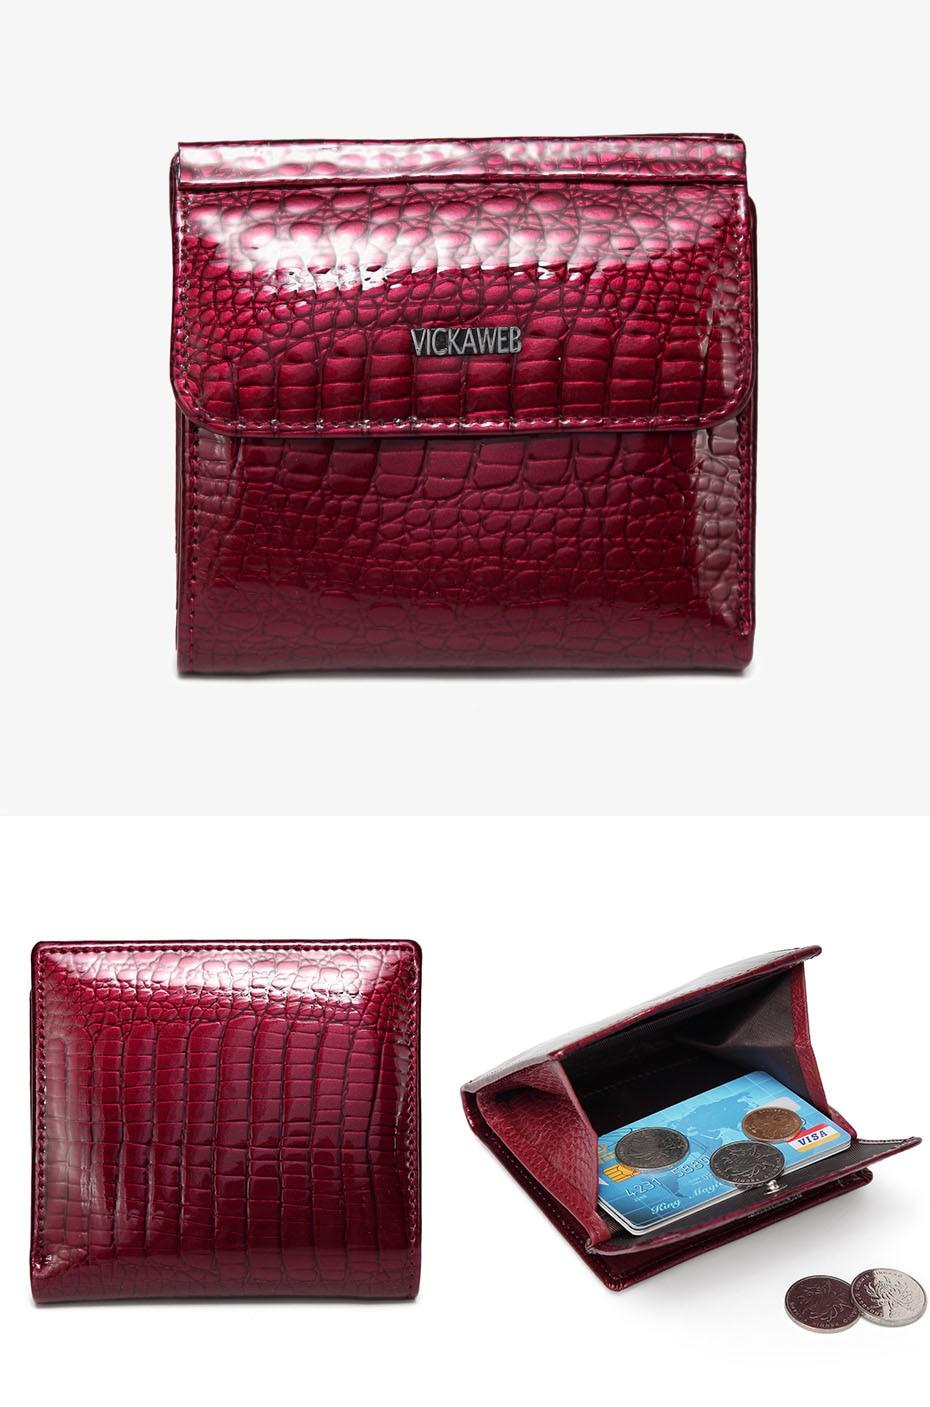 VICKAWEB Mini Wallet Women Genuine Leather Wallets Fashion Alligator Hasp Short Wallet Female Small Woman Wallets And Purses-AE209-017